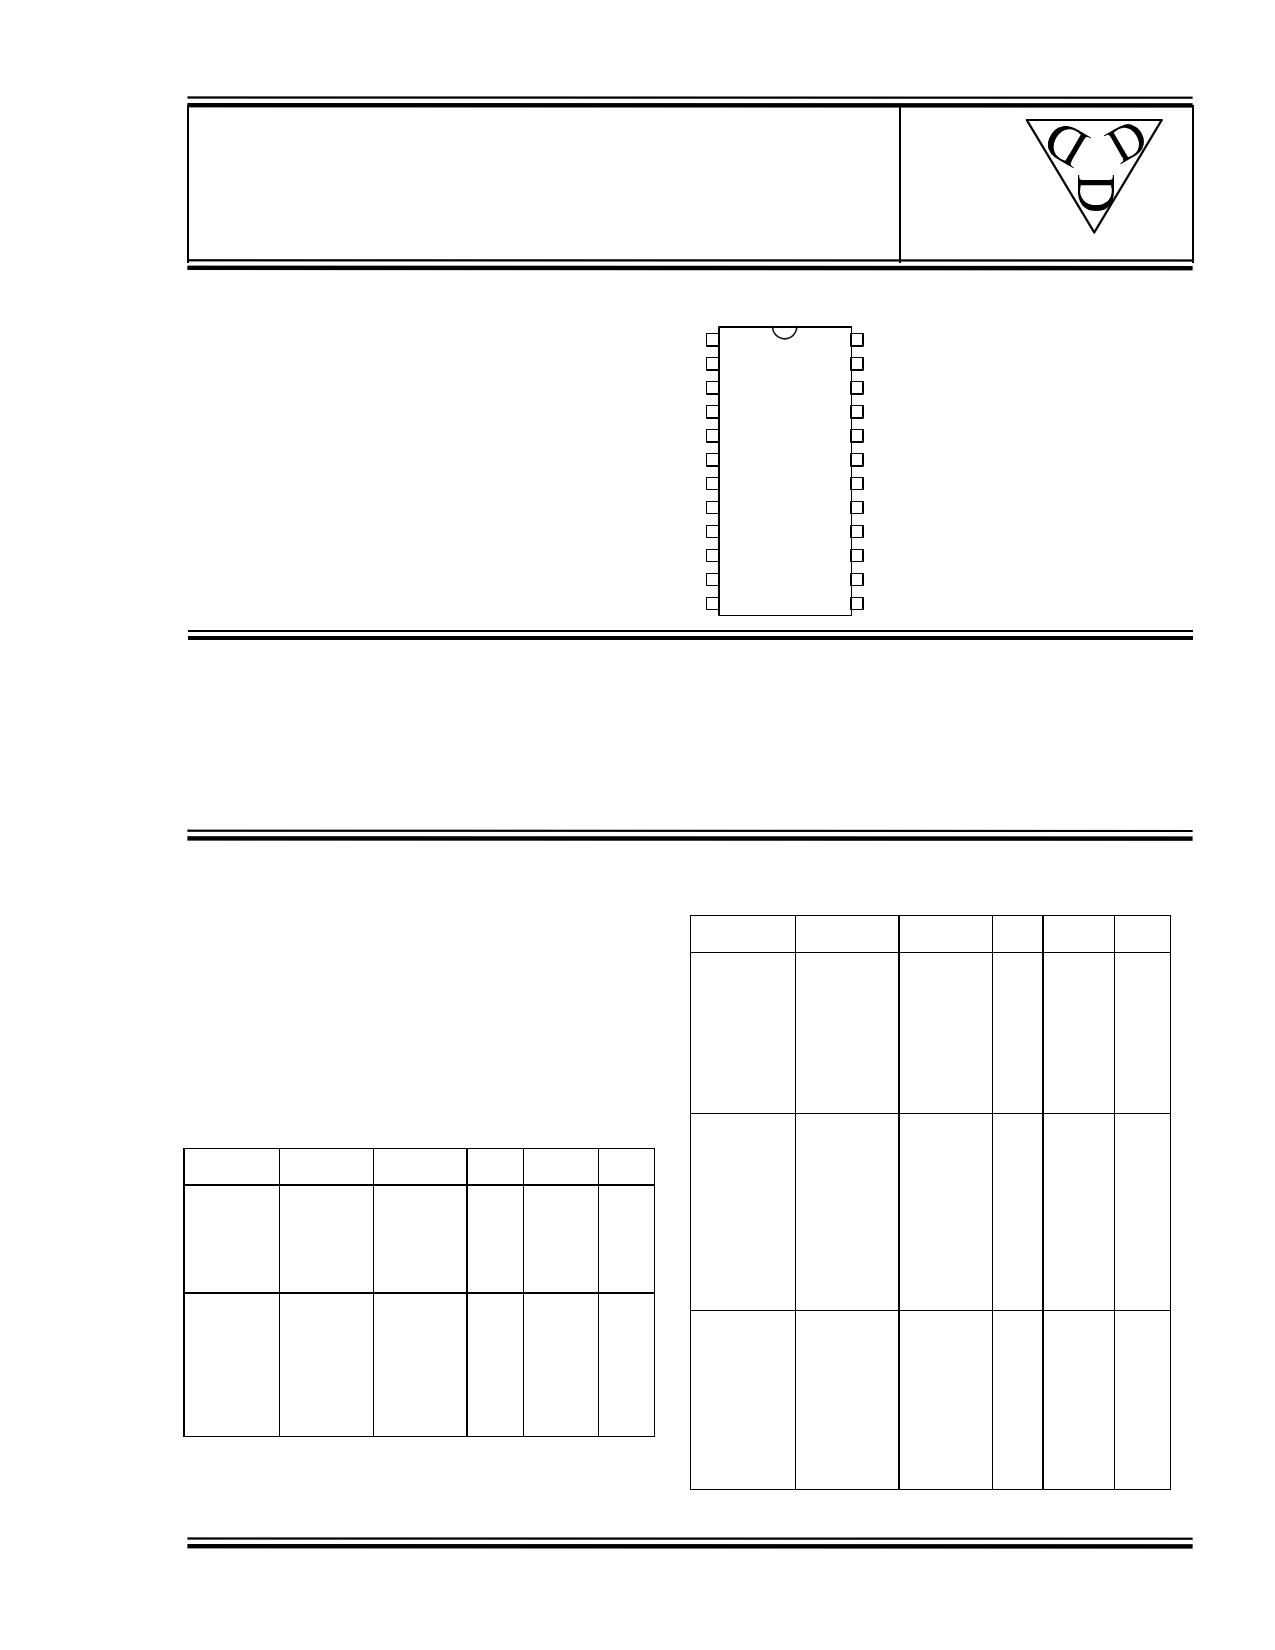 2214-50B Datasheet, 2214-50B PDF,ピン配置, 機能